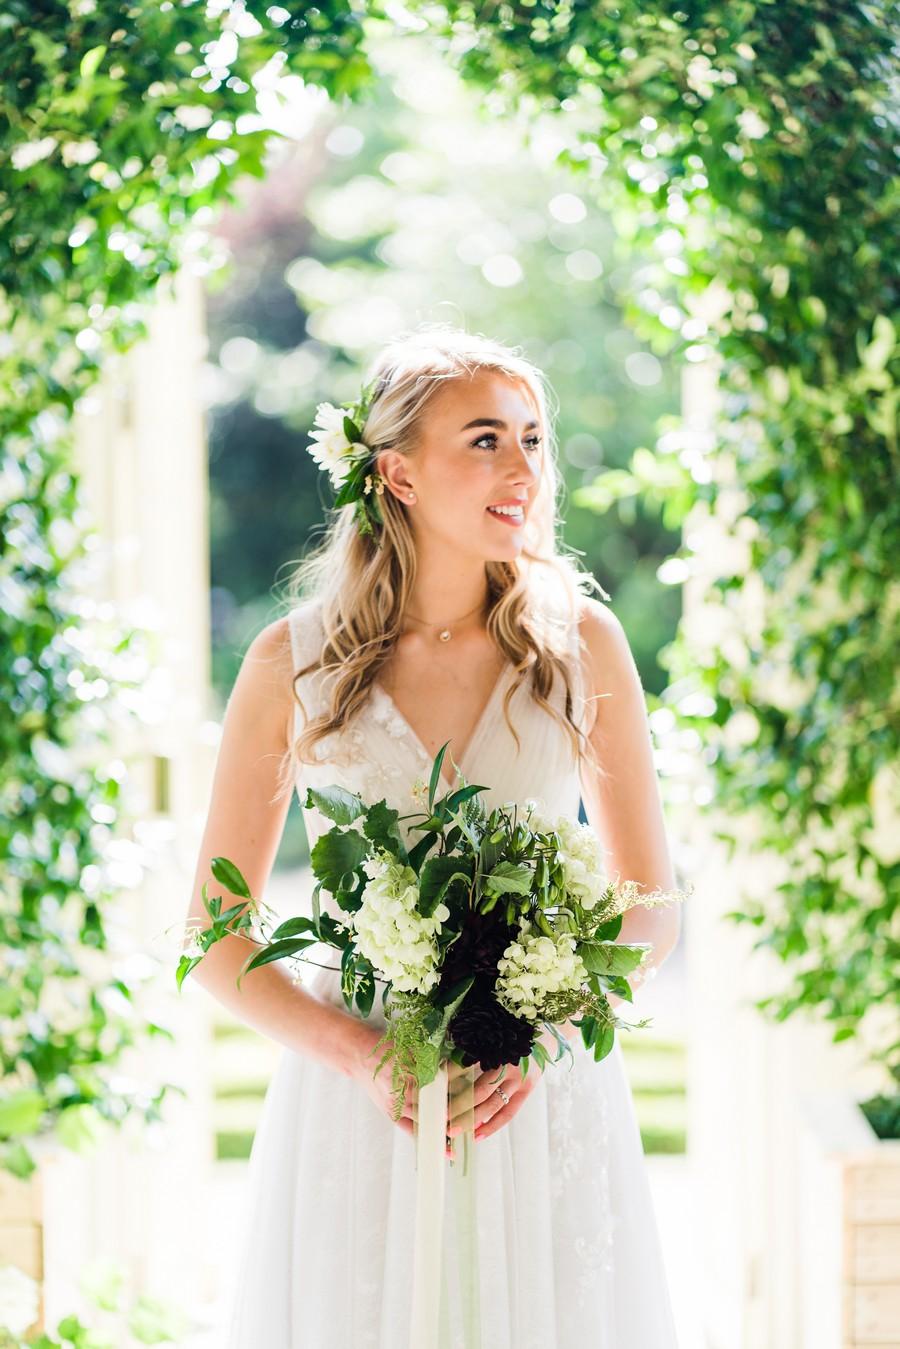 Highcliffe Castle wedding inspiration on the English Wedding Blog (27)